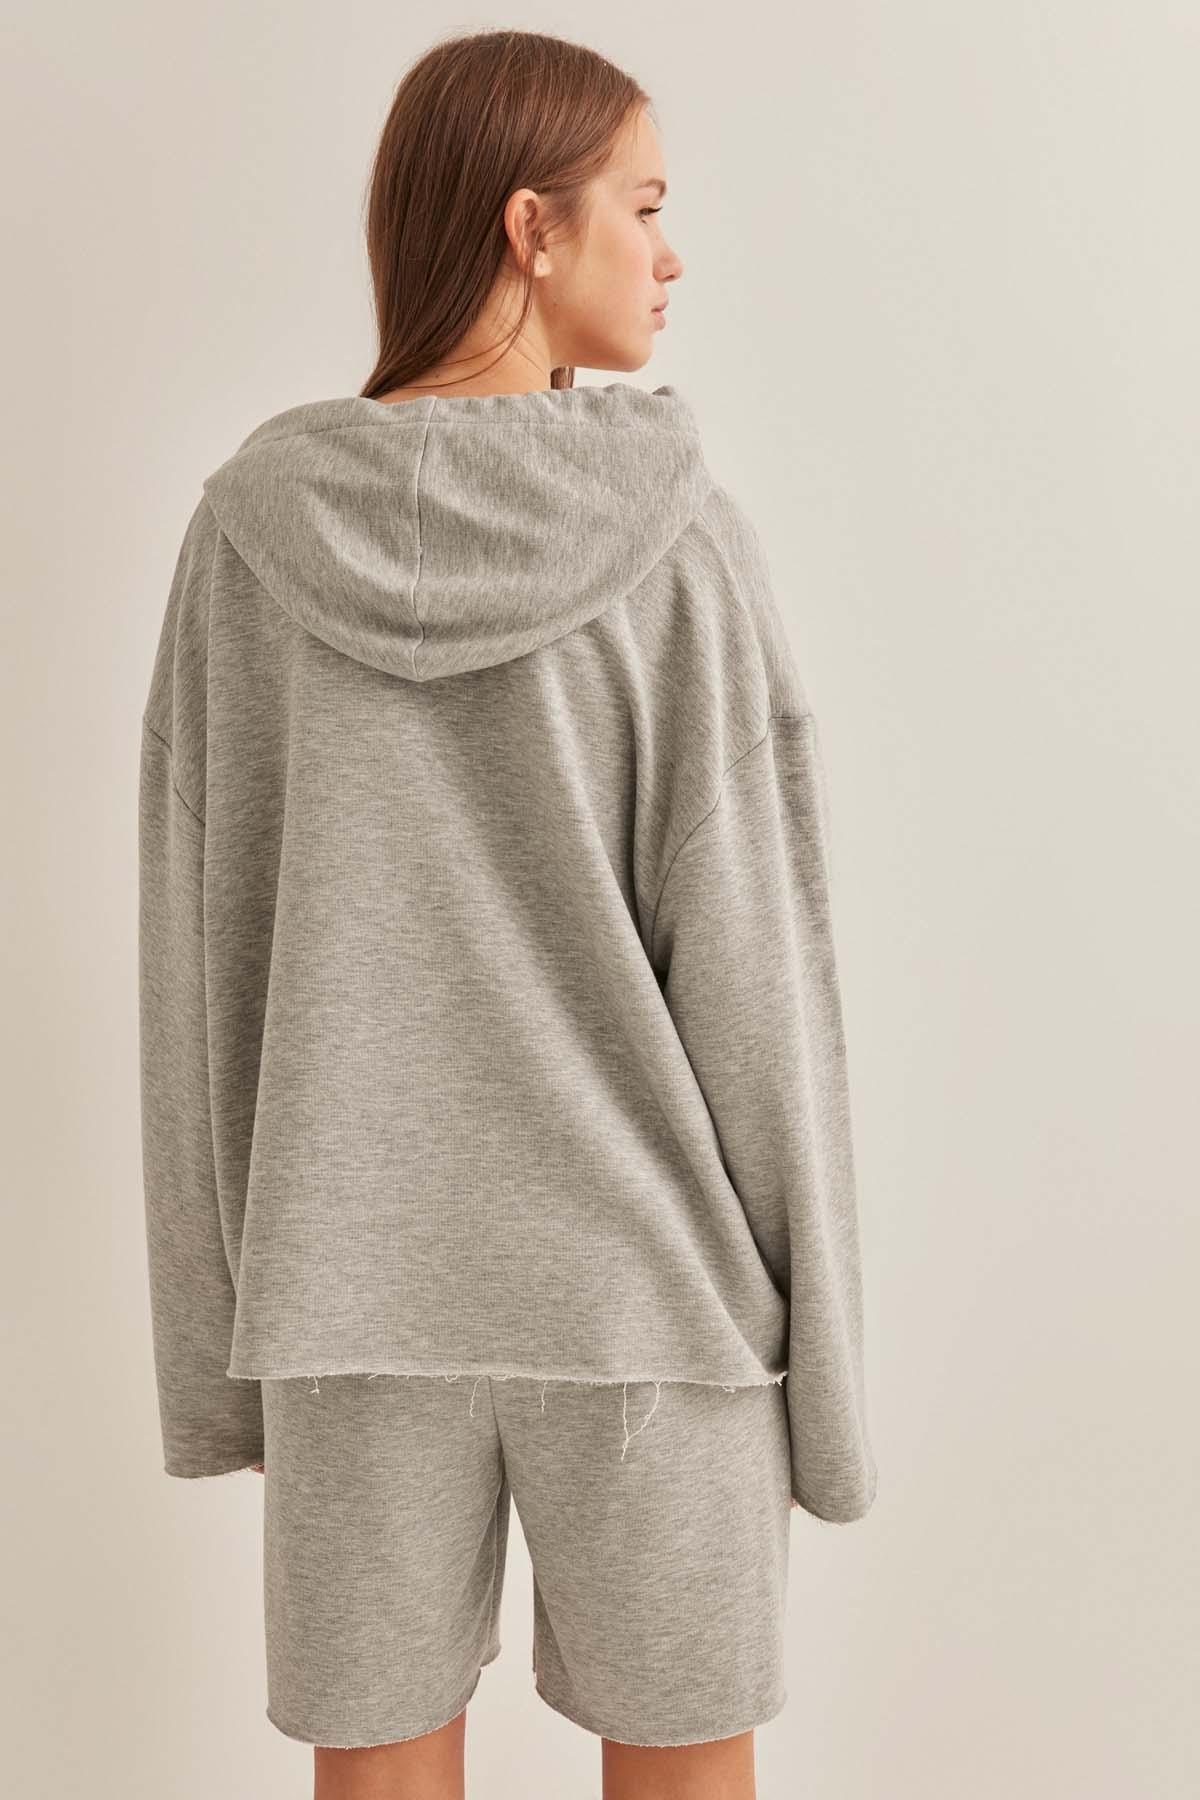 Kapşonlu Bol Form Sweatshirt - Thumbnail